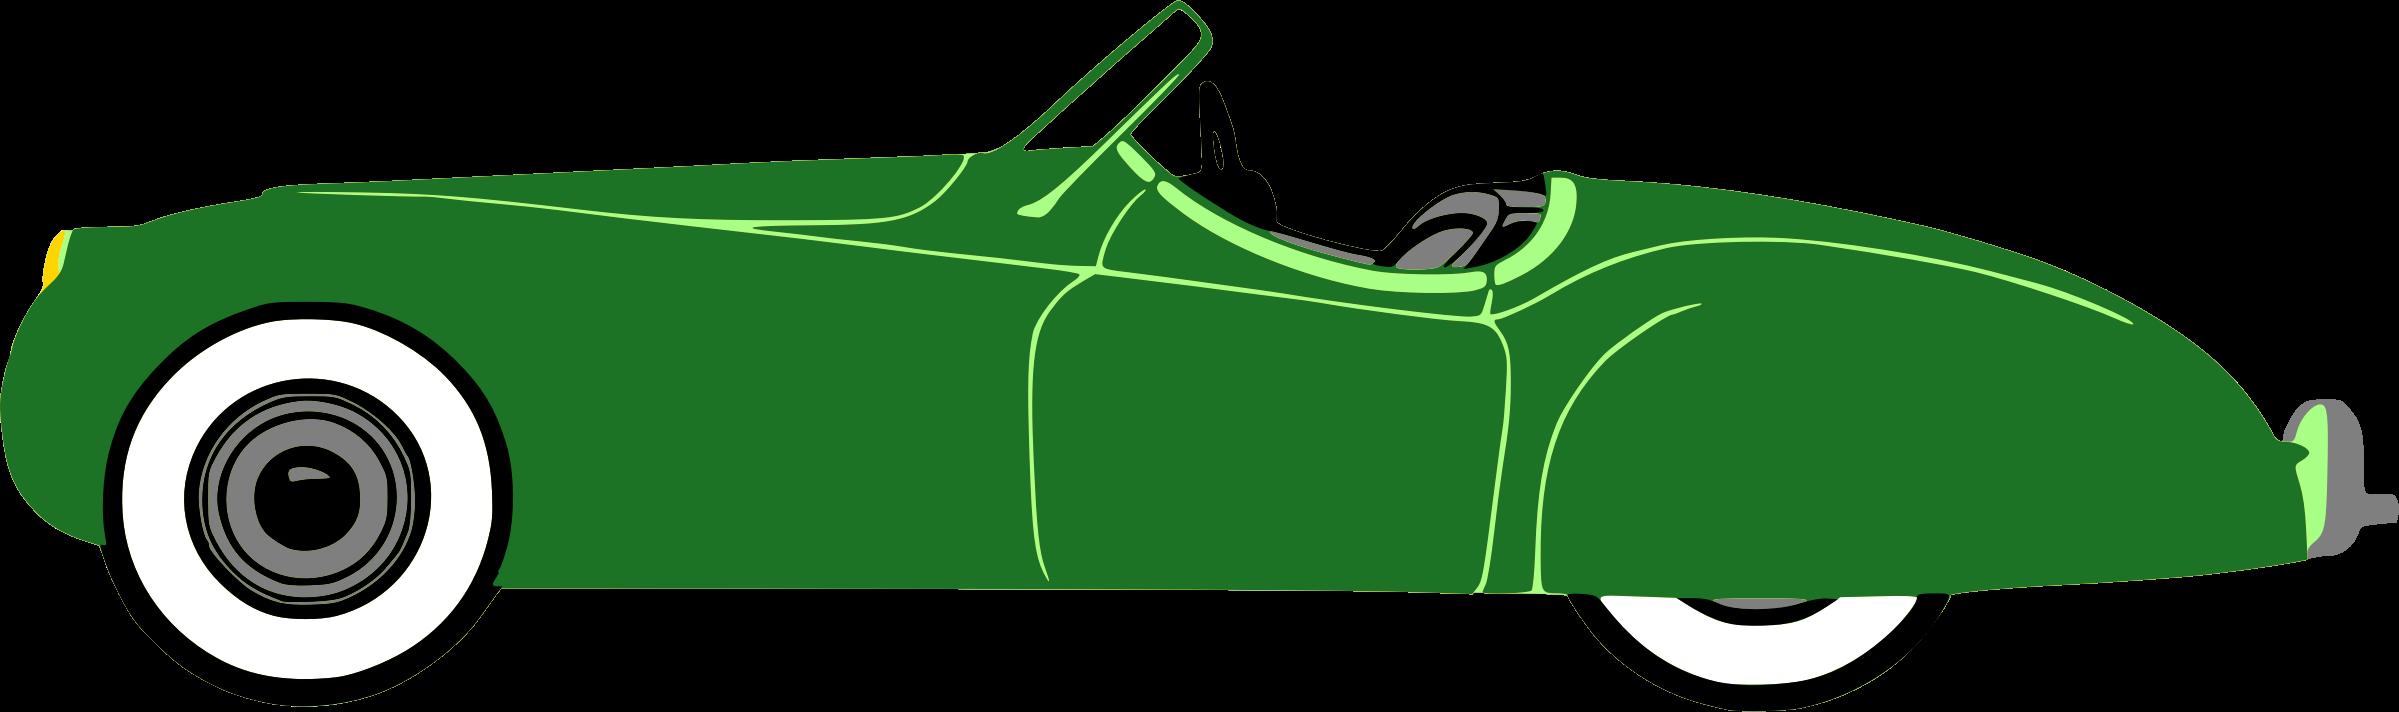 Clipart car colour. Big image png